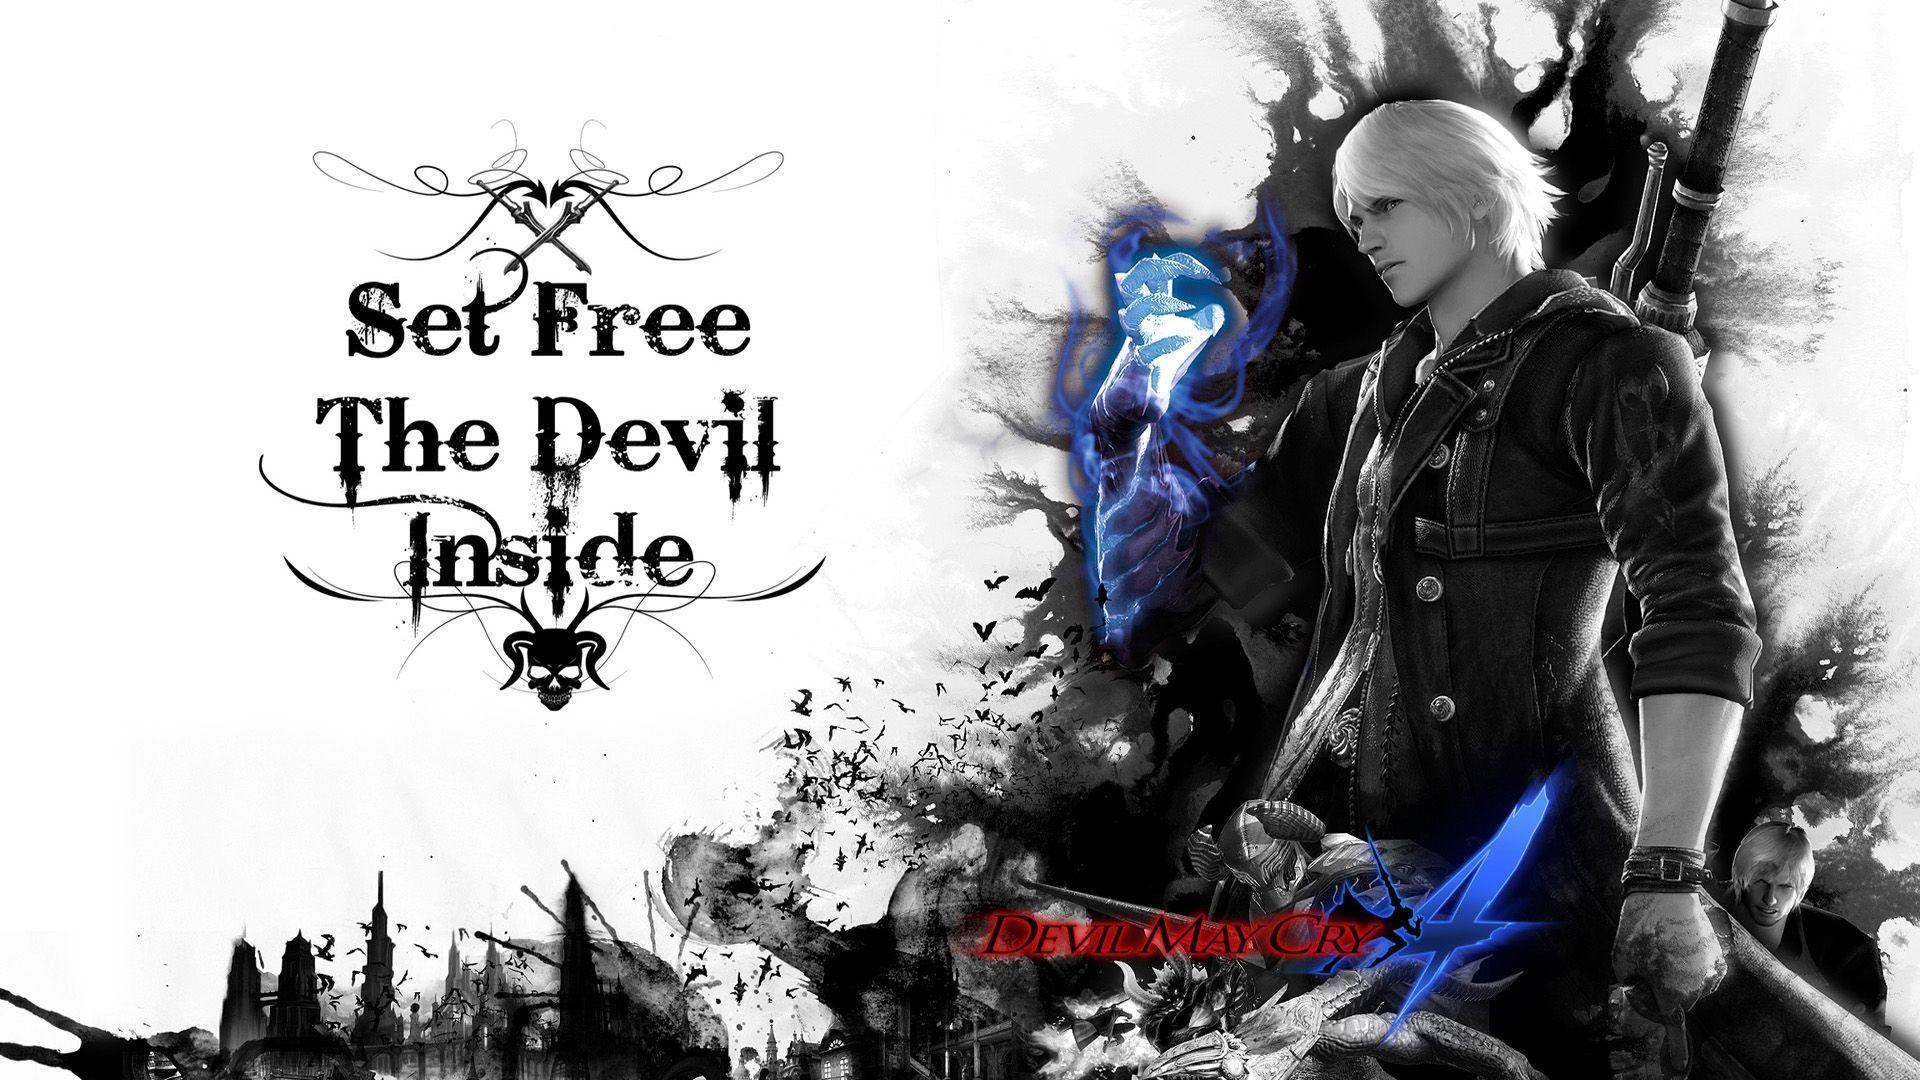 the devil inside movie free download